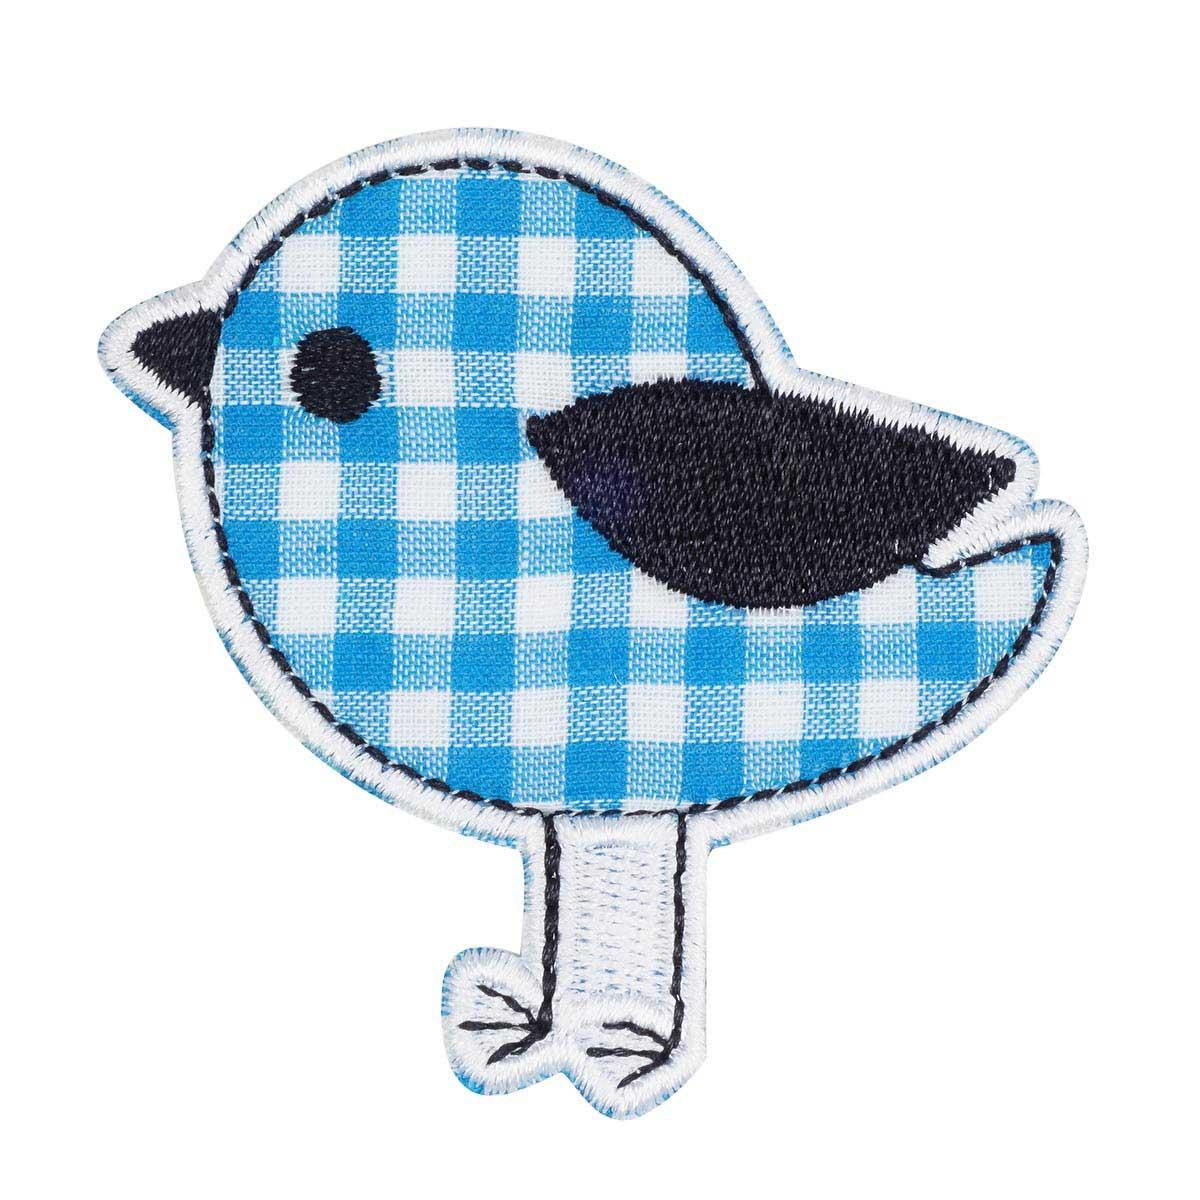 EMB-17012 Термоаппликация 'Птичка синяя' 6,5*6cm Hobby&Pro